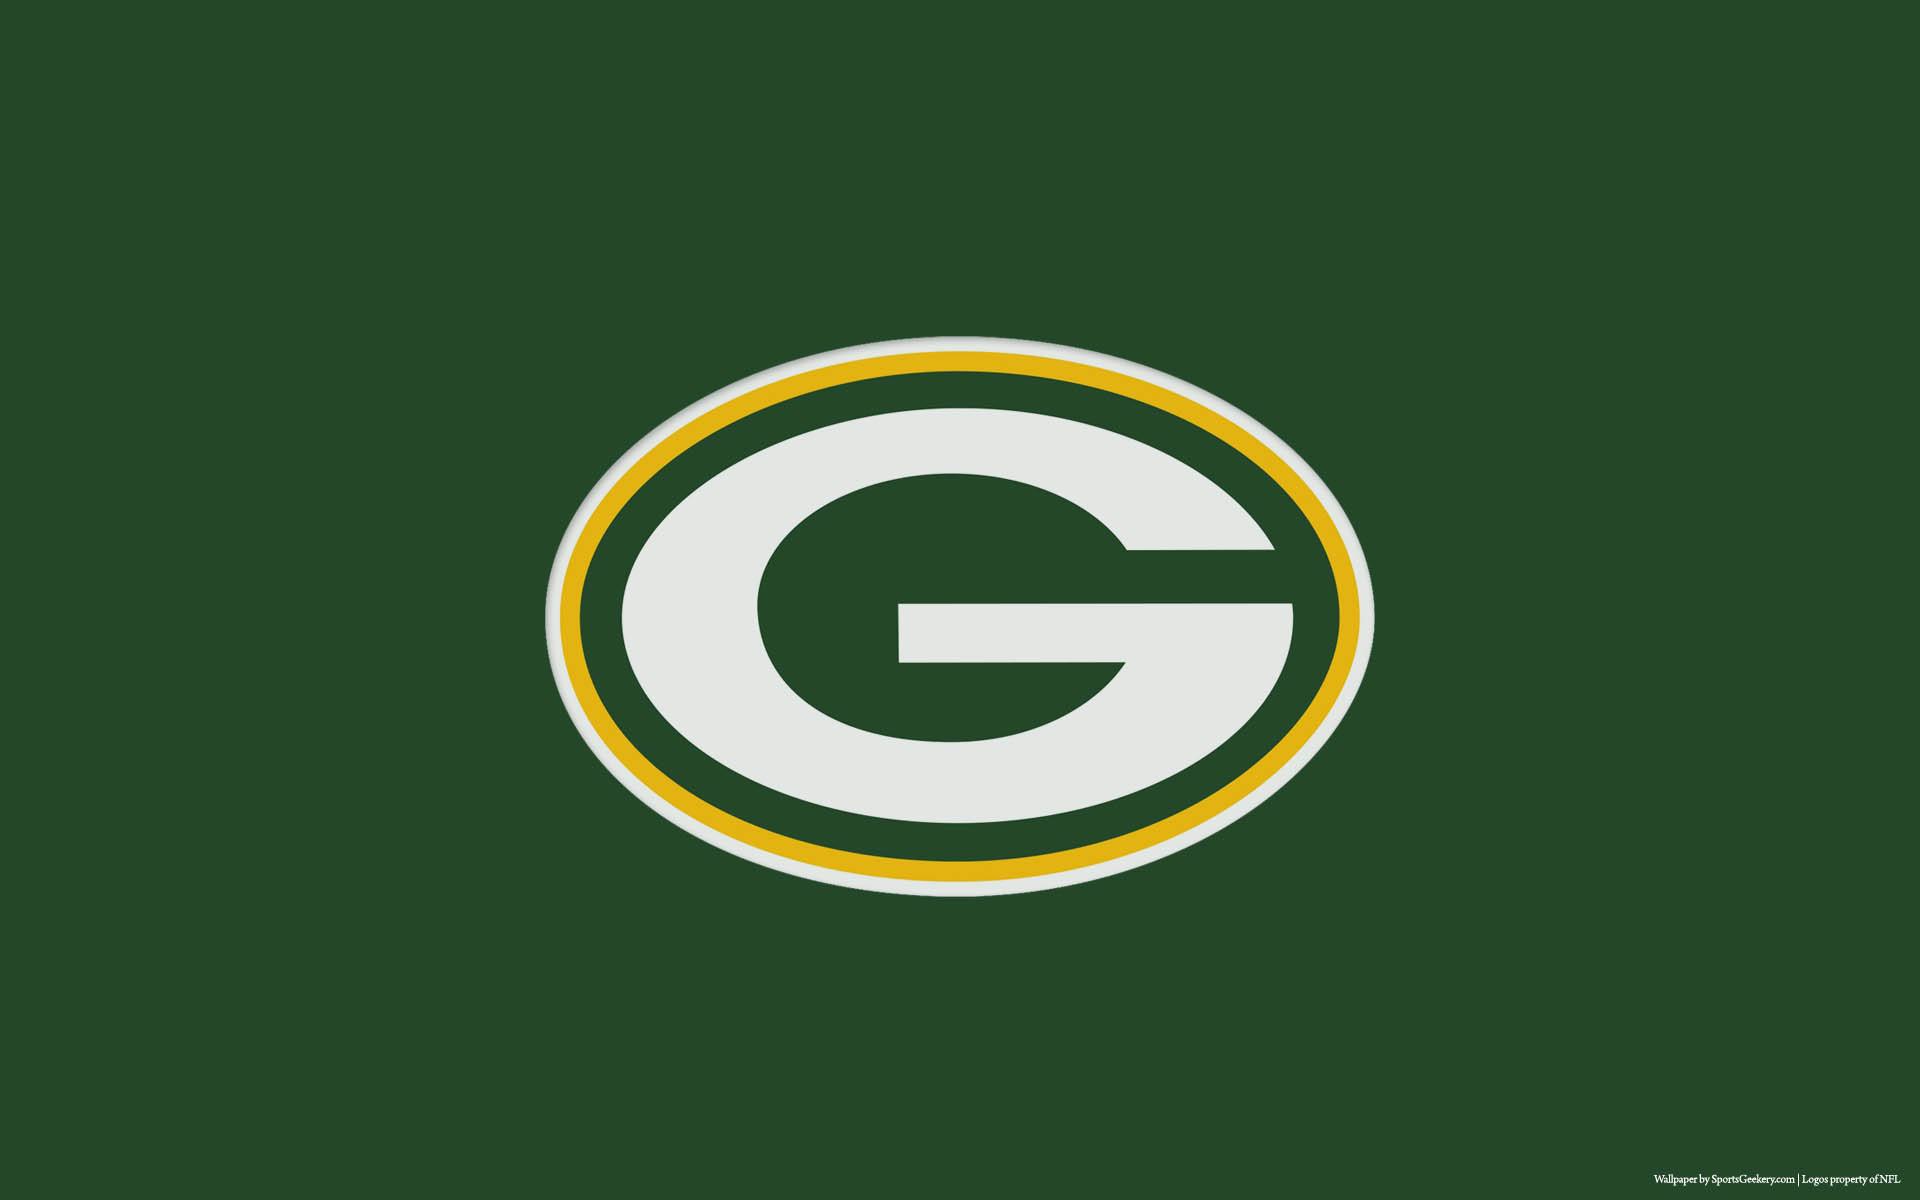 … green bay packers nfl football r wallpaper 155185 …